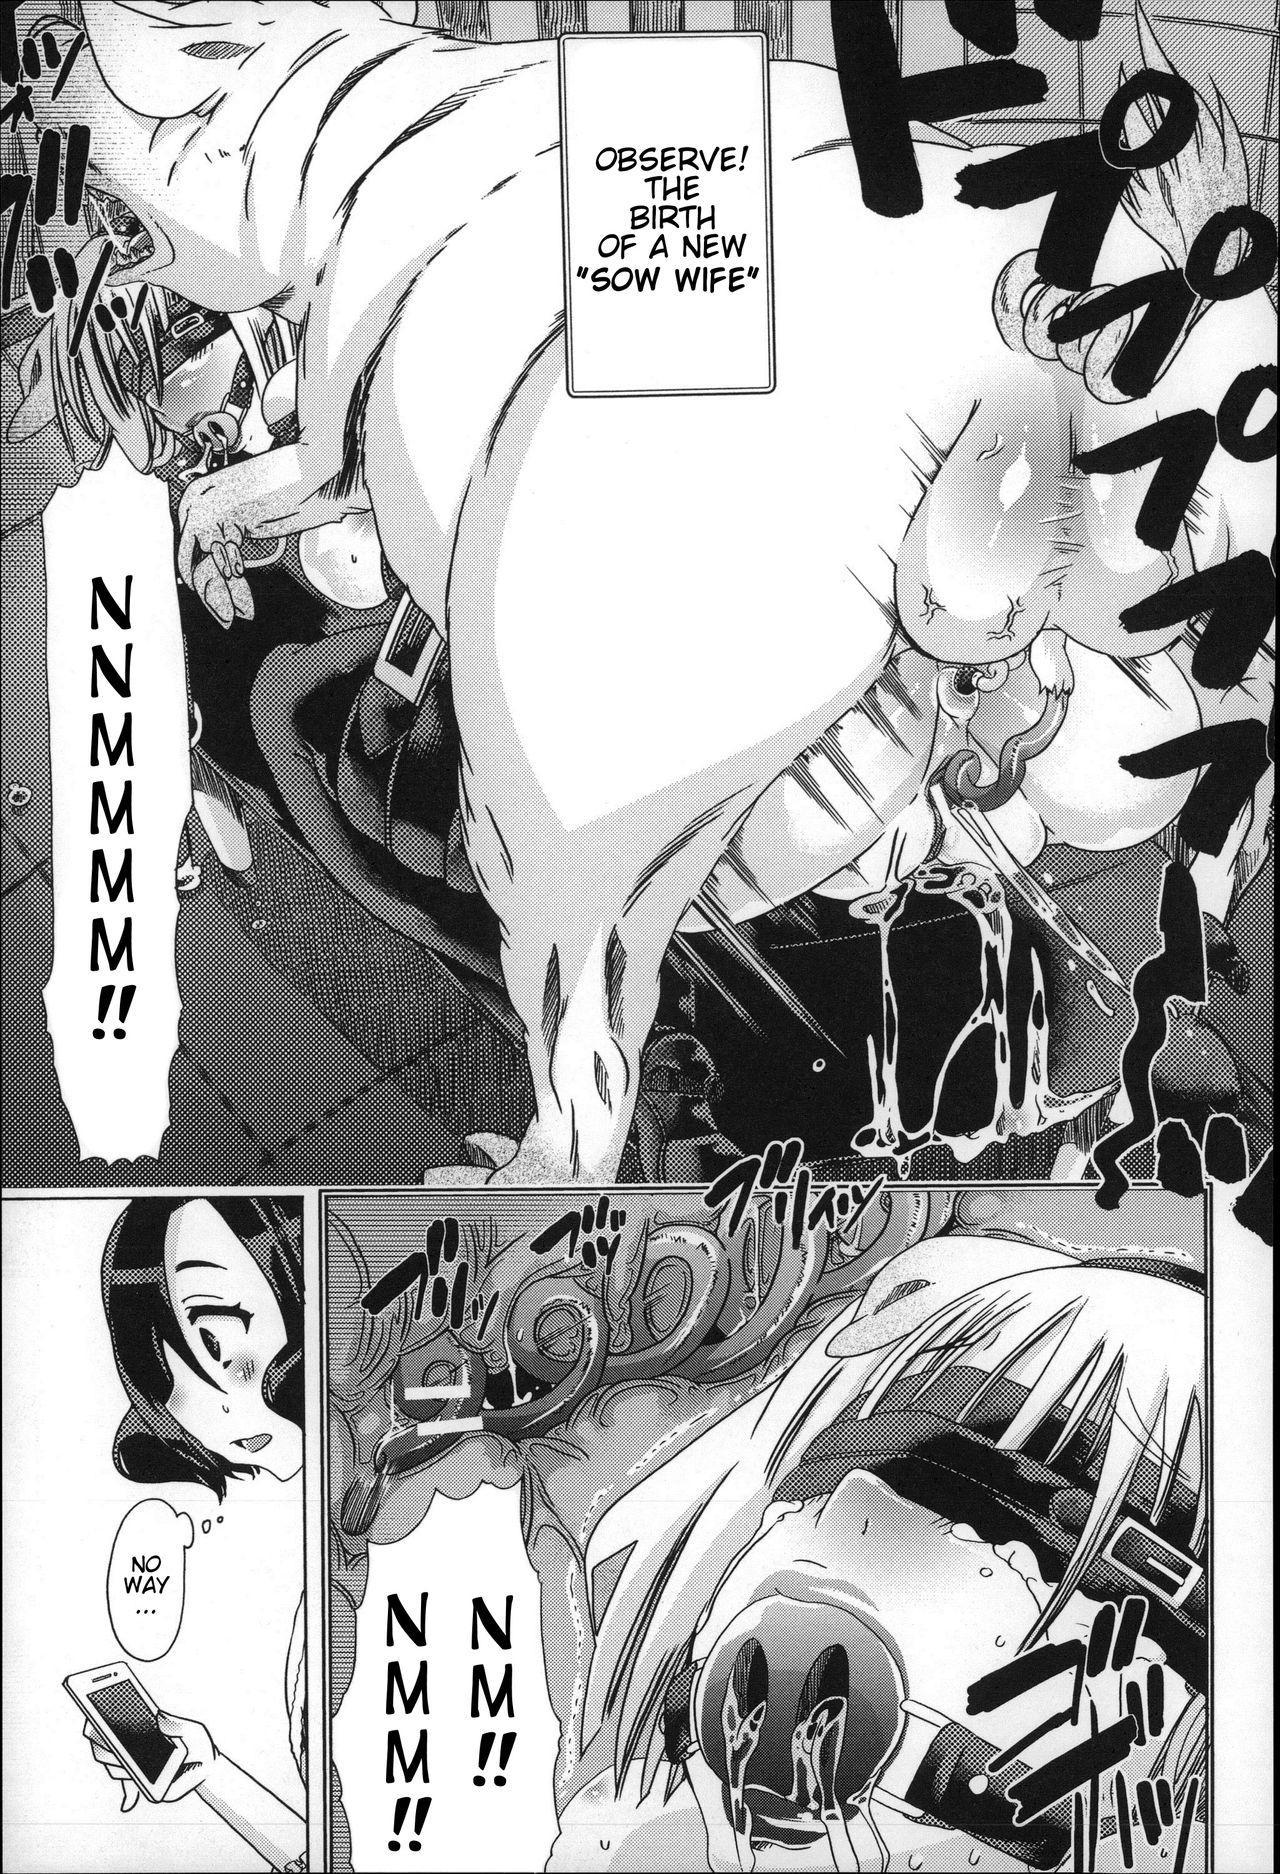 [Chikiko] Juukan - Tonkatsu   Bestiality - Pork Life (Cutlet) (Juukan Nikubenki Kasumi) [English] [Neeko7] 6